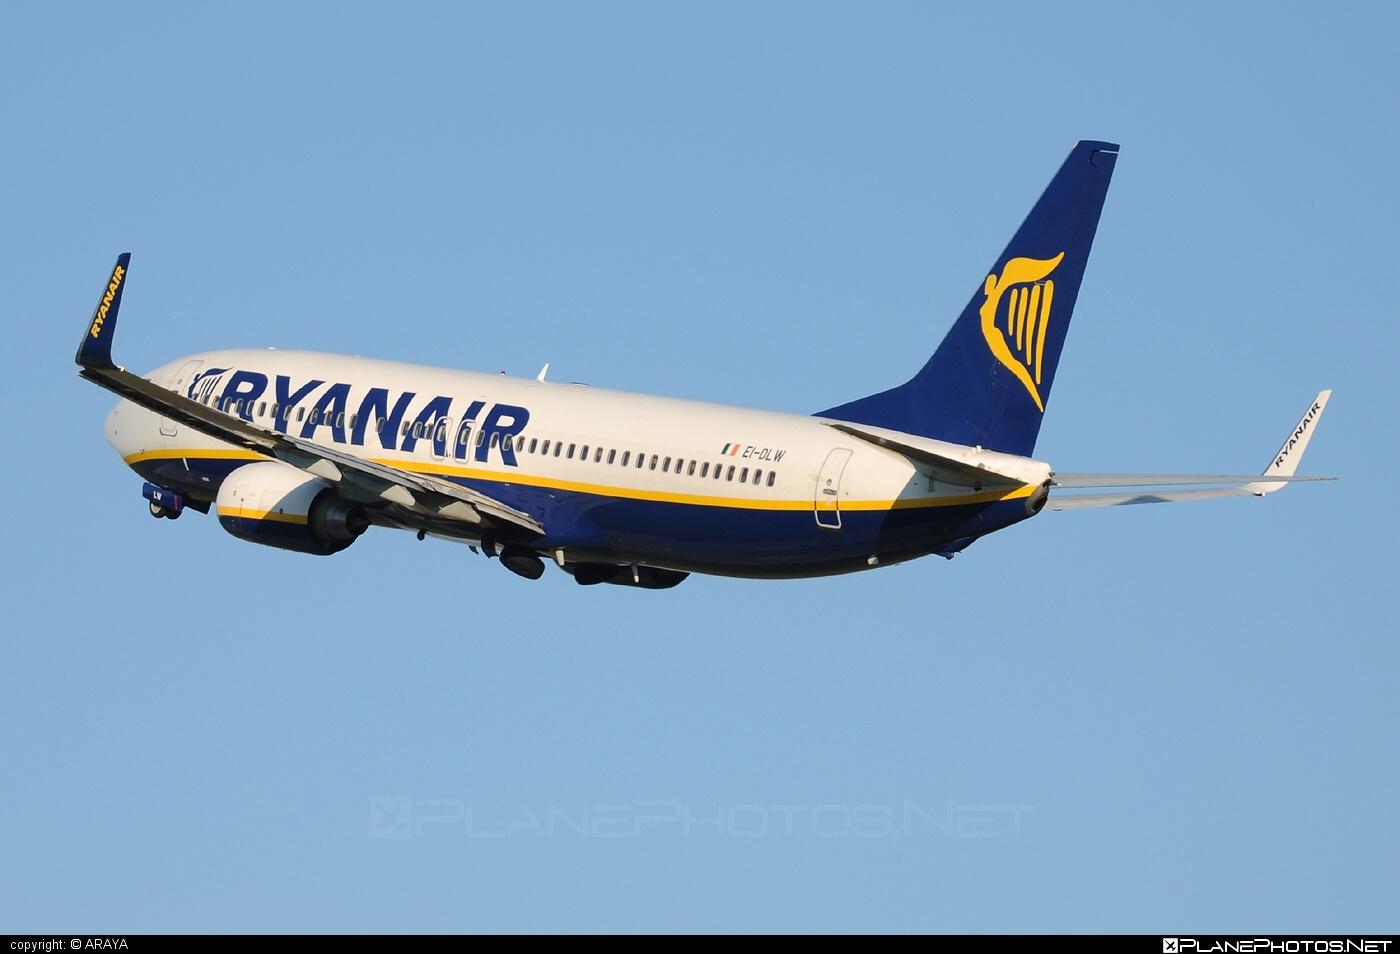 Boeing 737-800 - EI-DLW operated by Ryanair #b737 #b737nextgen #b737ng #boeing #boeing737 #ryanair